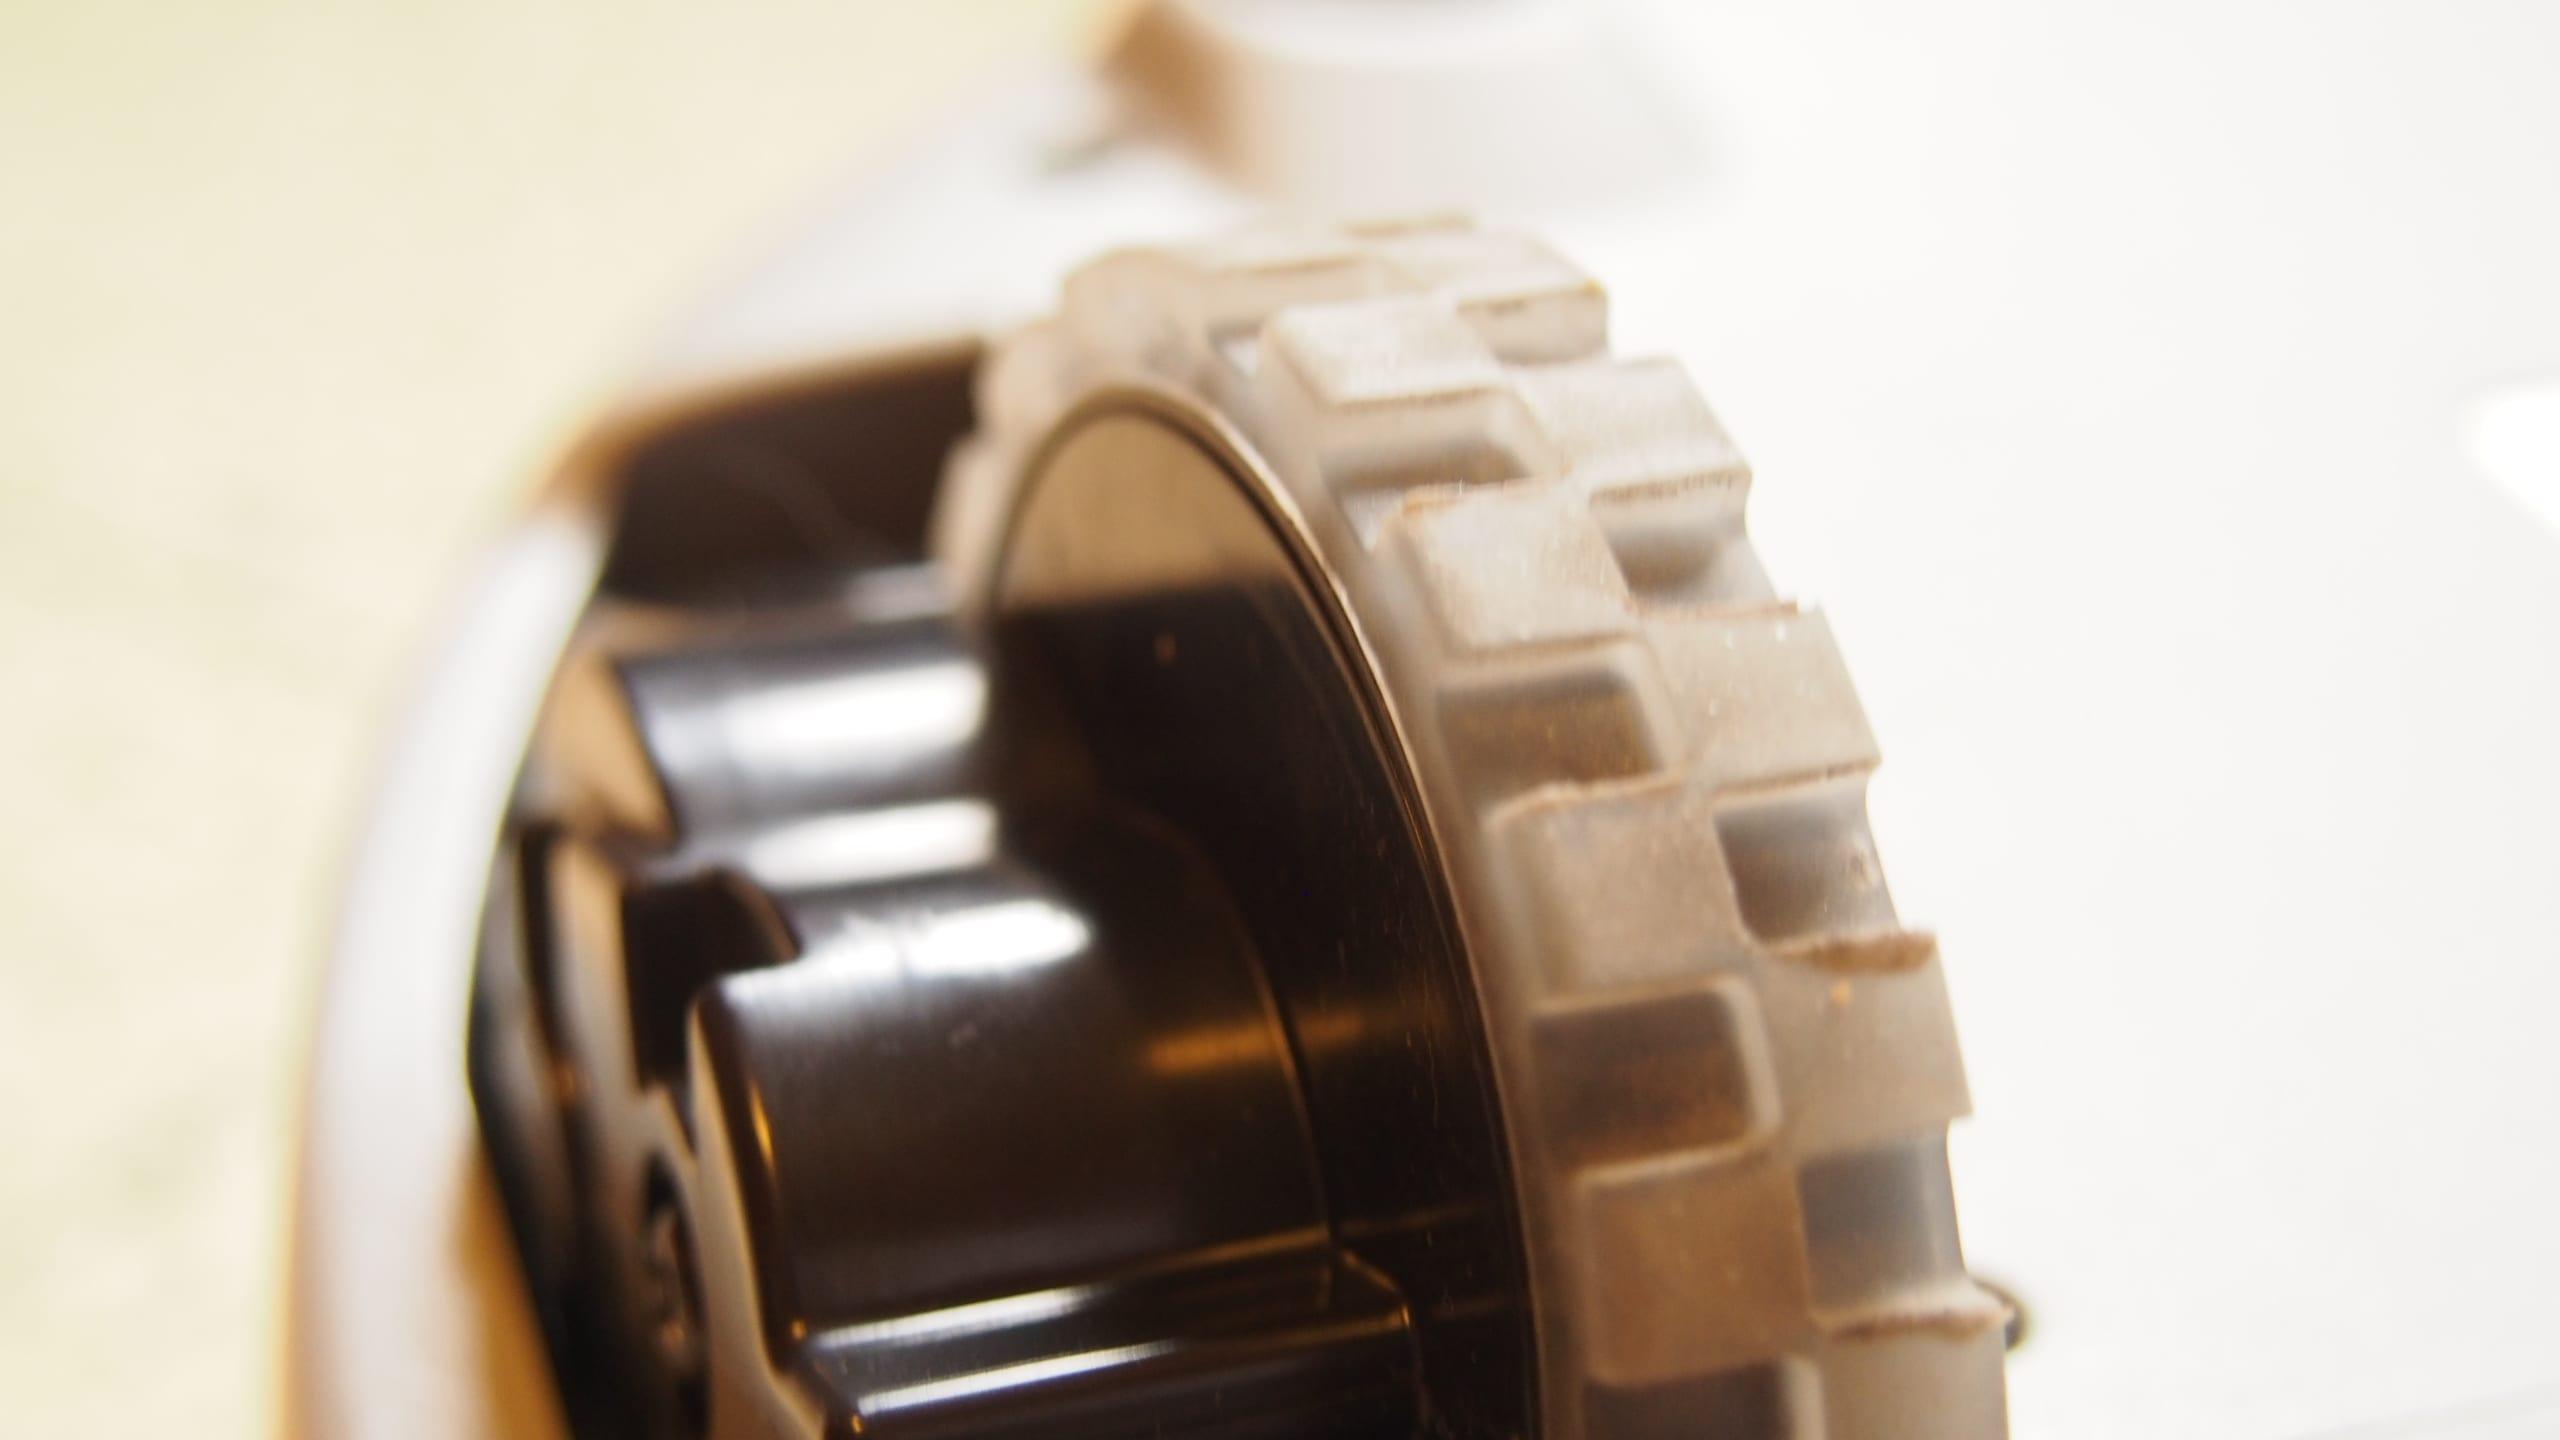 neato vaccum wheel